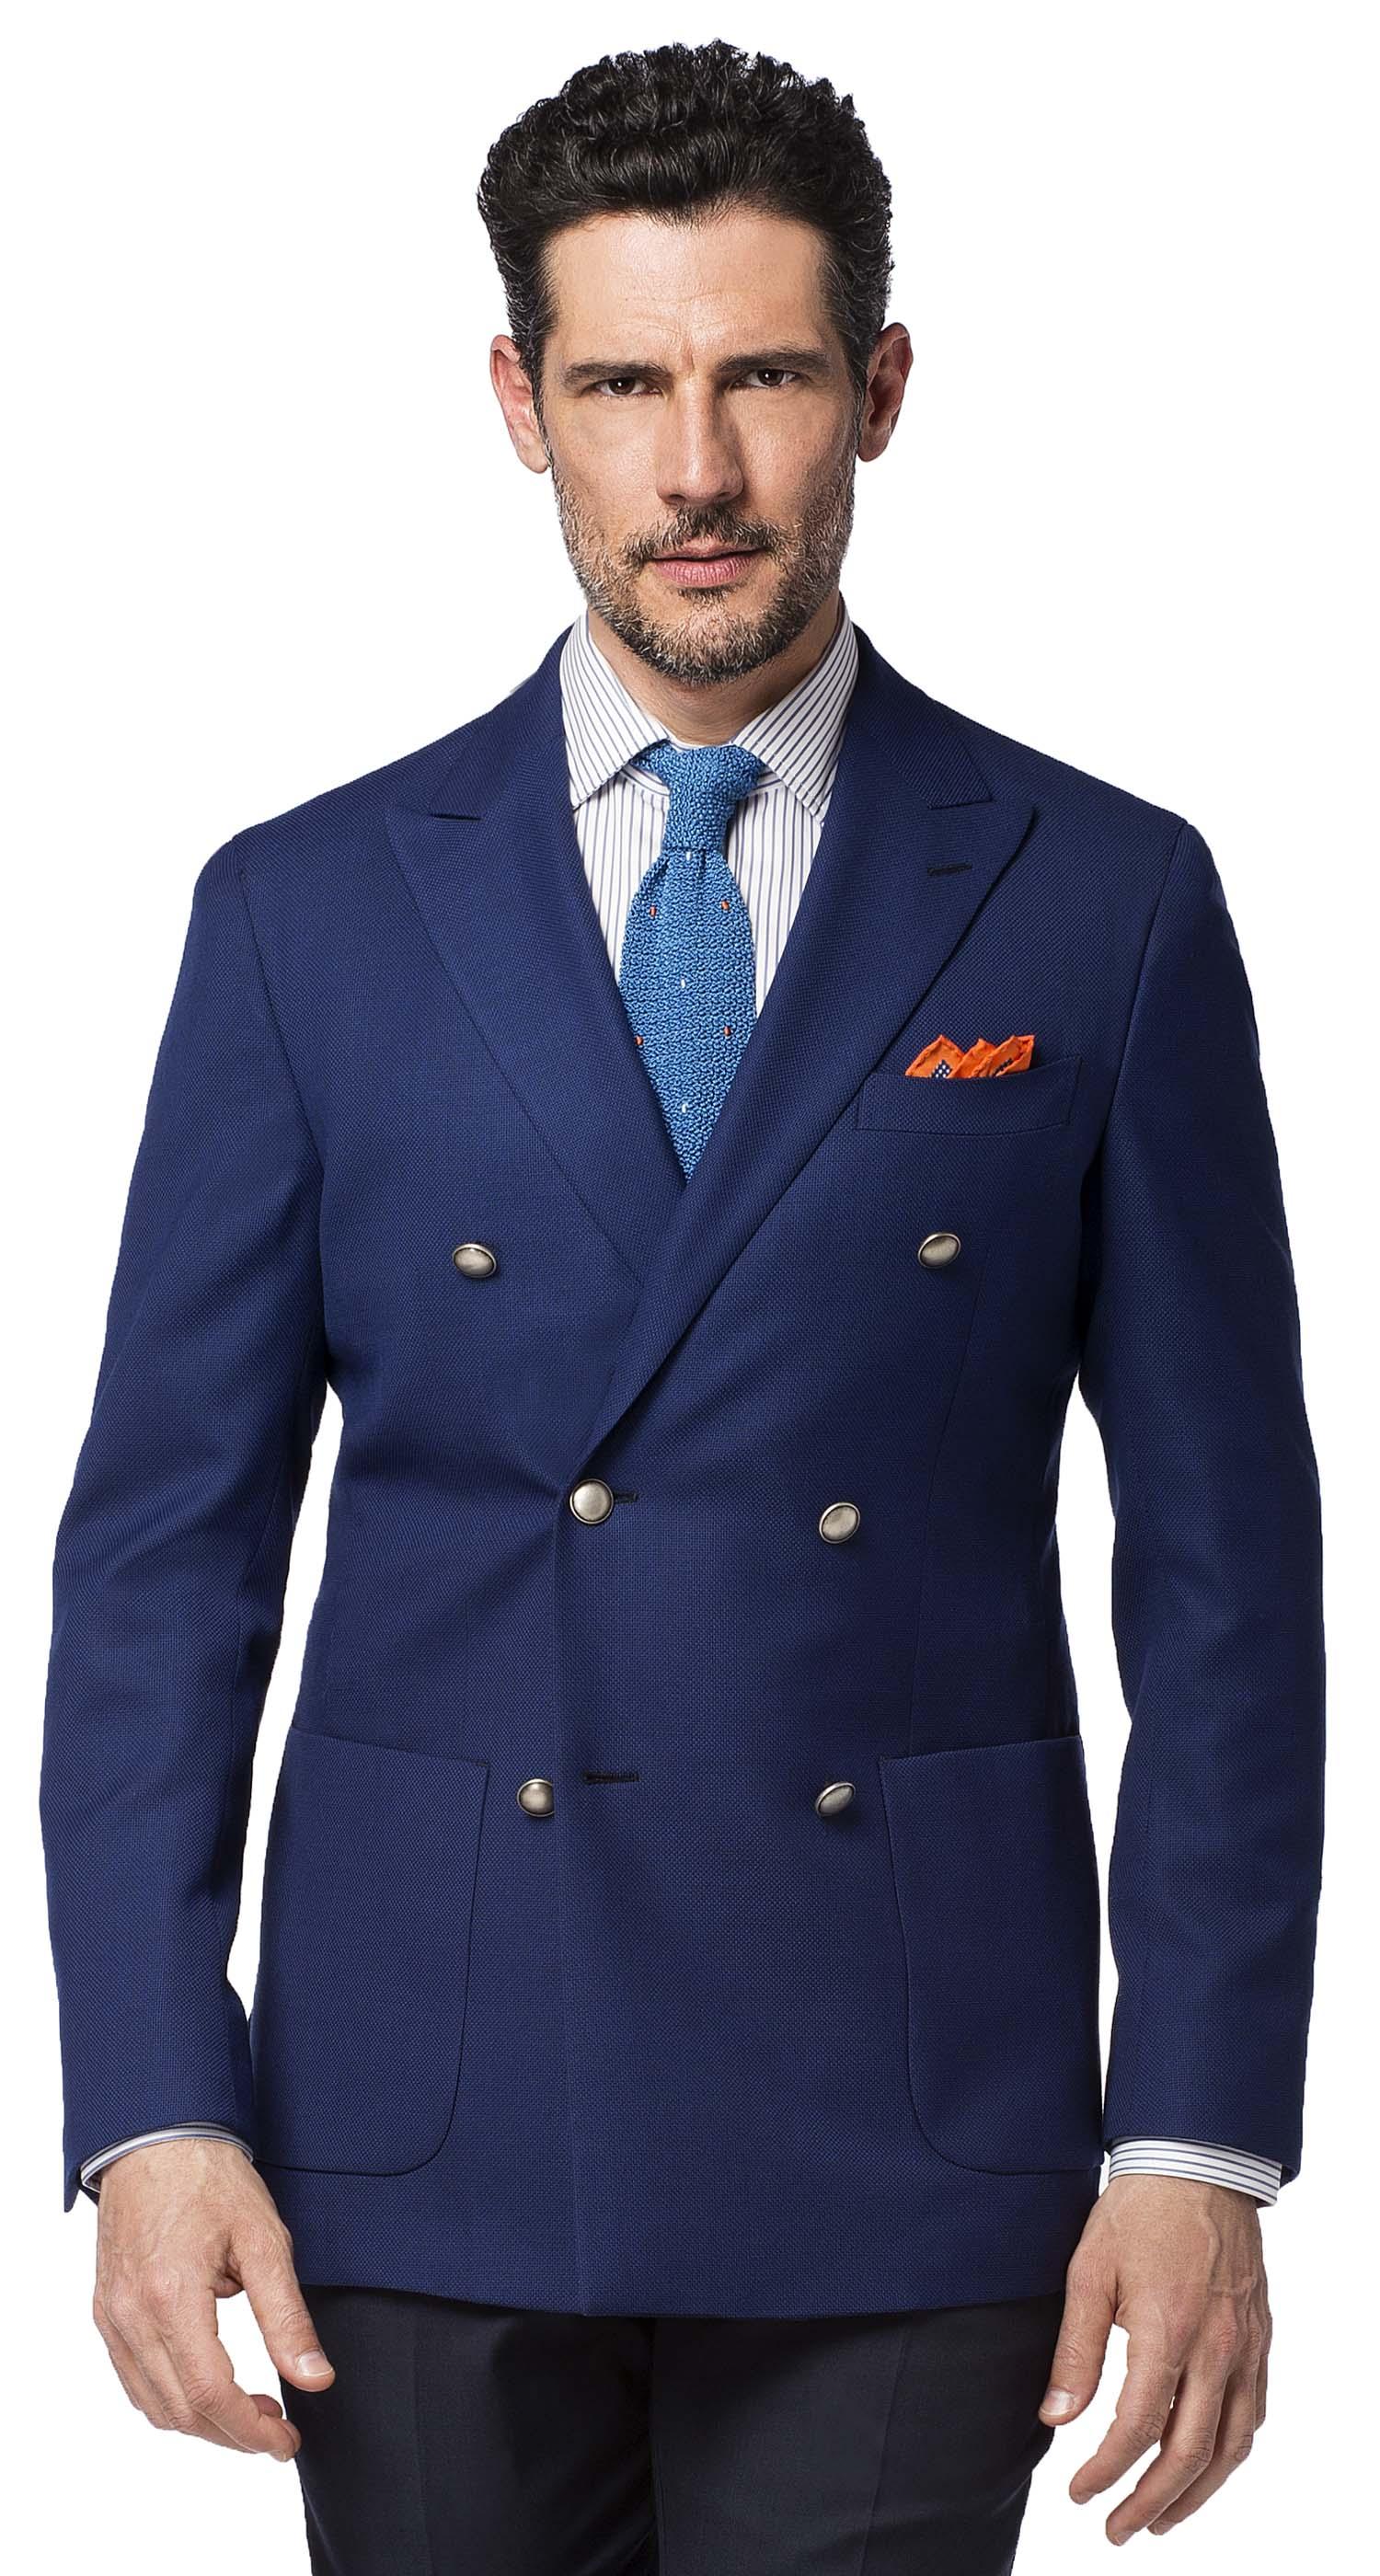 pantaloni marroni e giacca blu